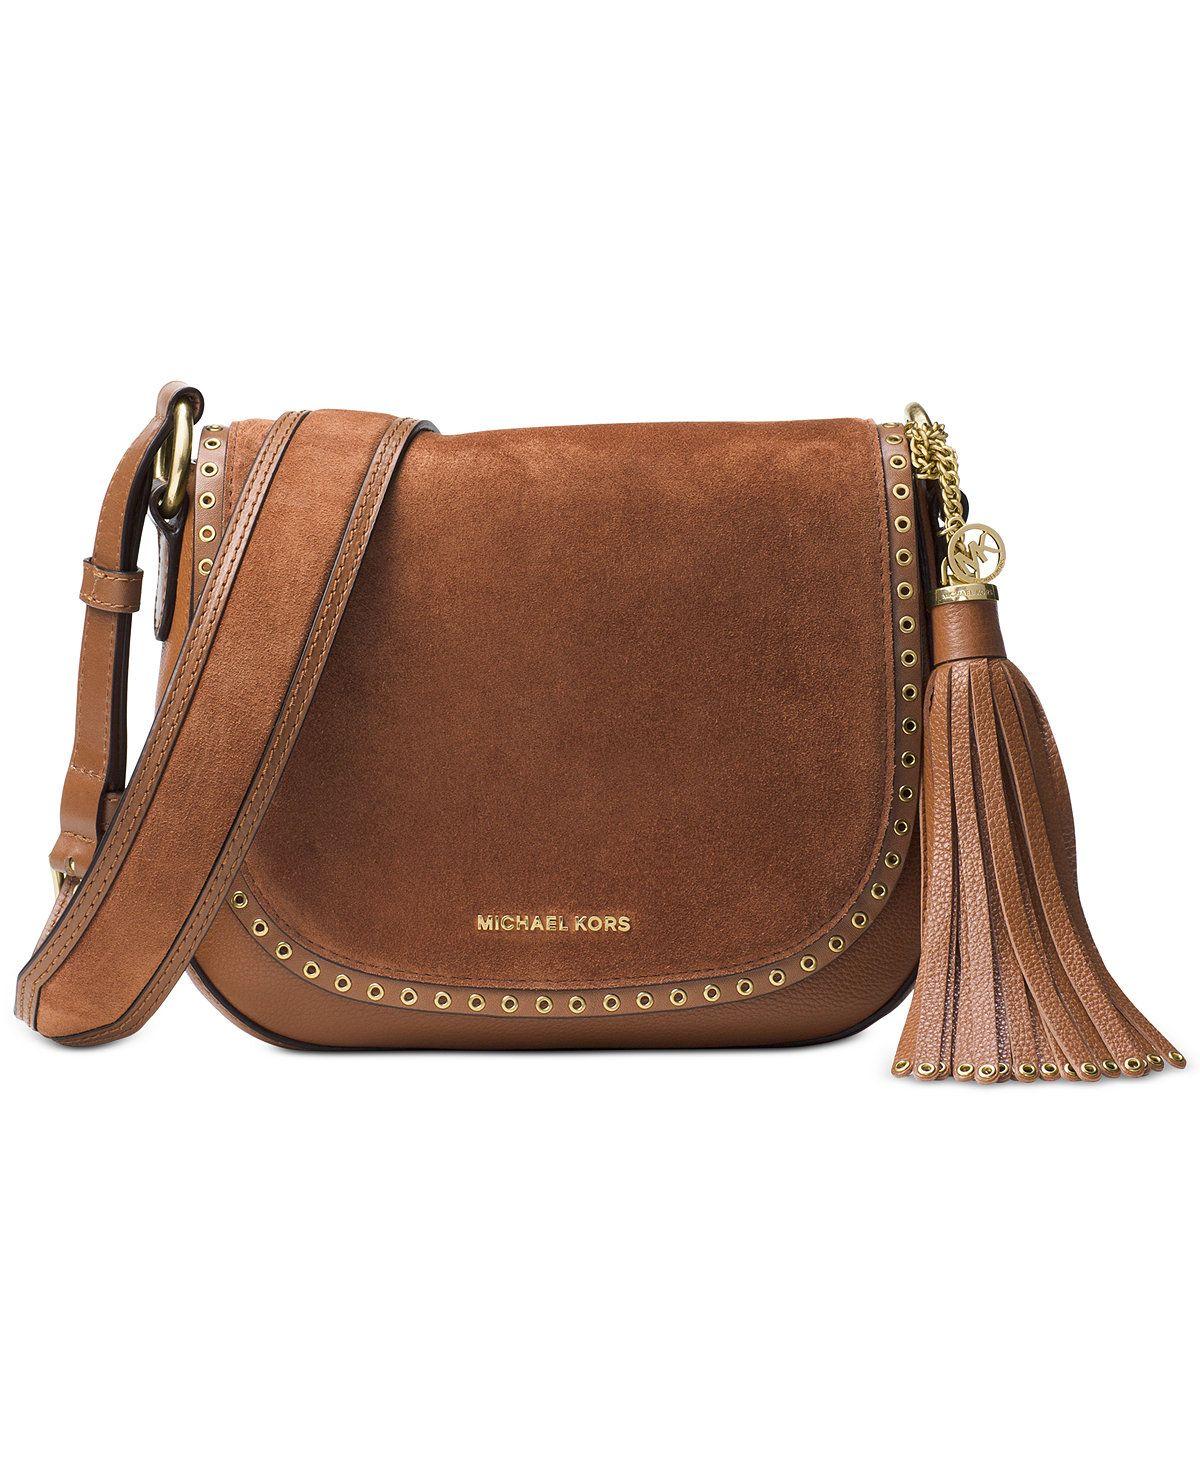 MICHAEL Michael Kors Brooklyn Suede Medium Saddle Bag - Designer Handbags -  Handbags \u0026 Accessories -